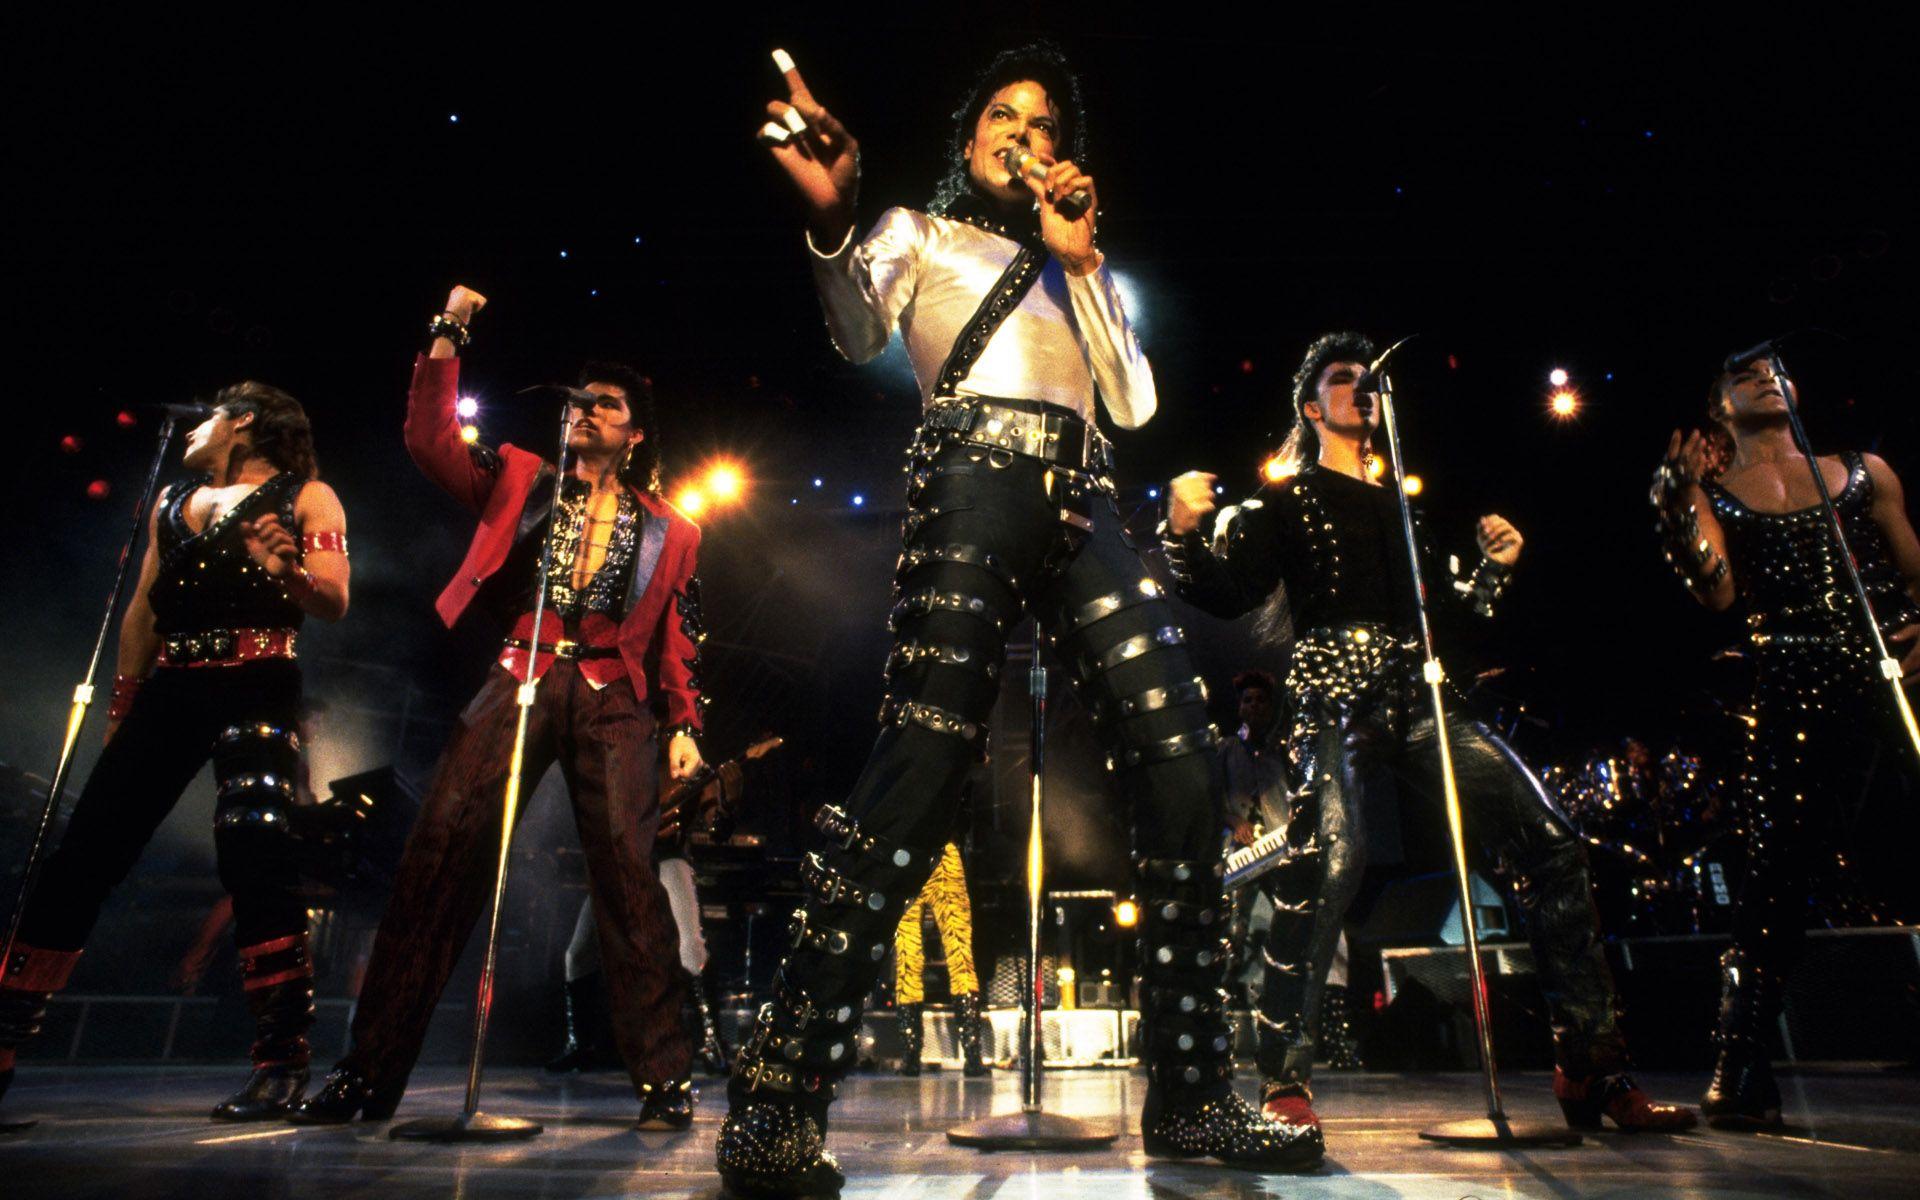 MJ on the stage Michael jackson bad, Fondo de pantalla